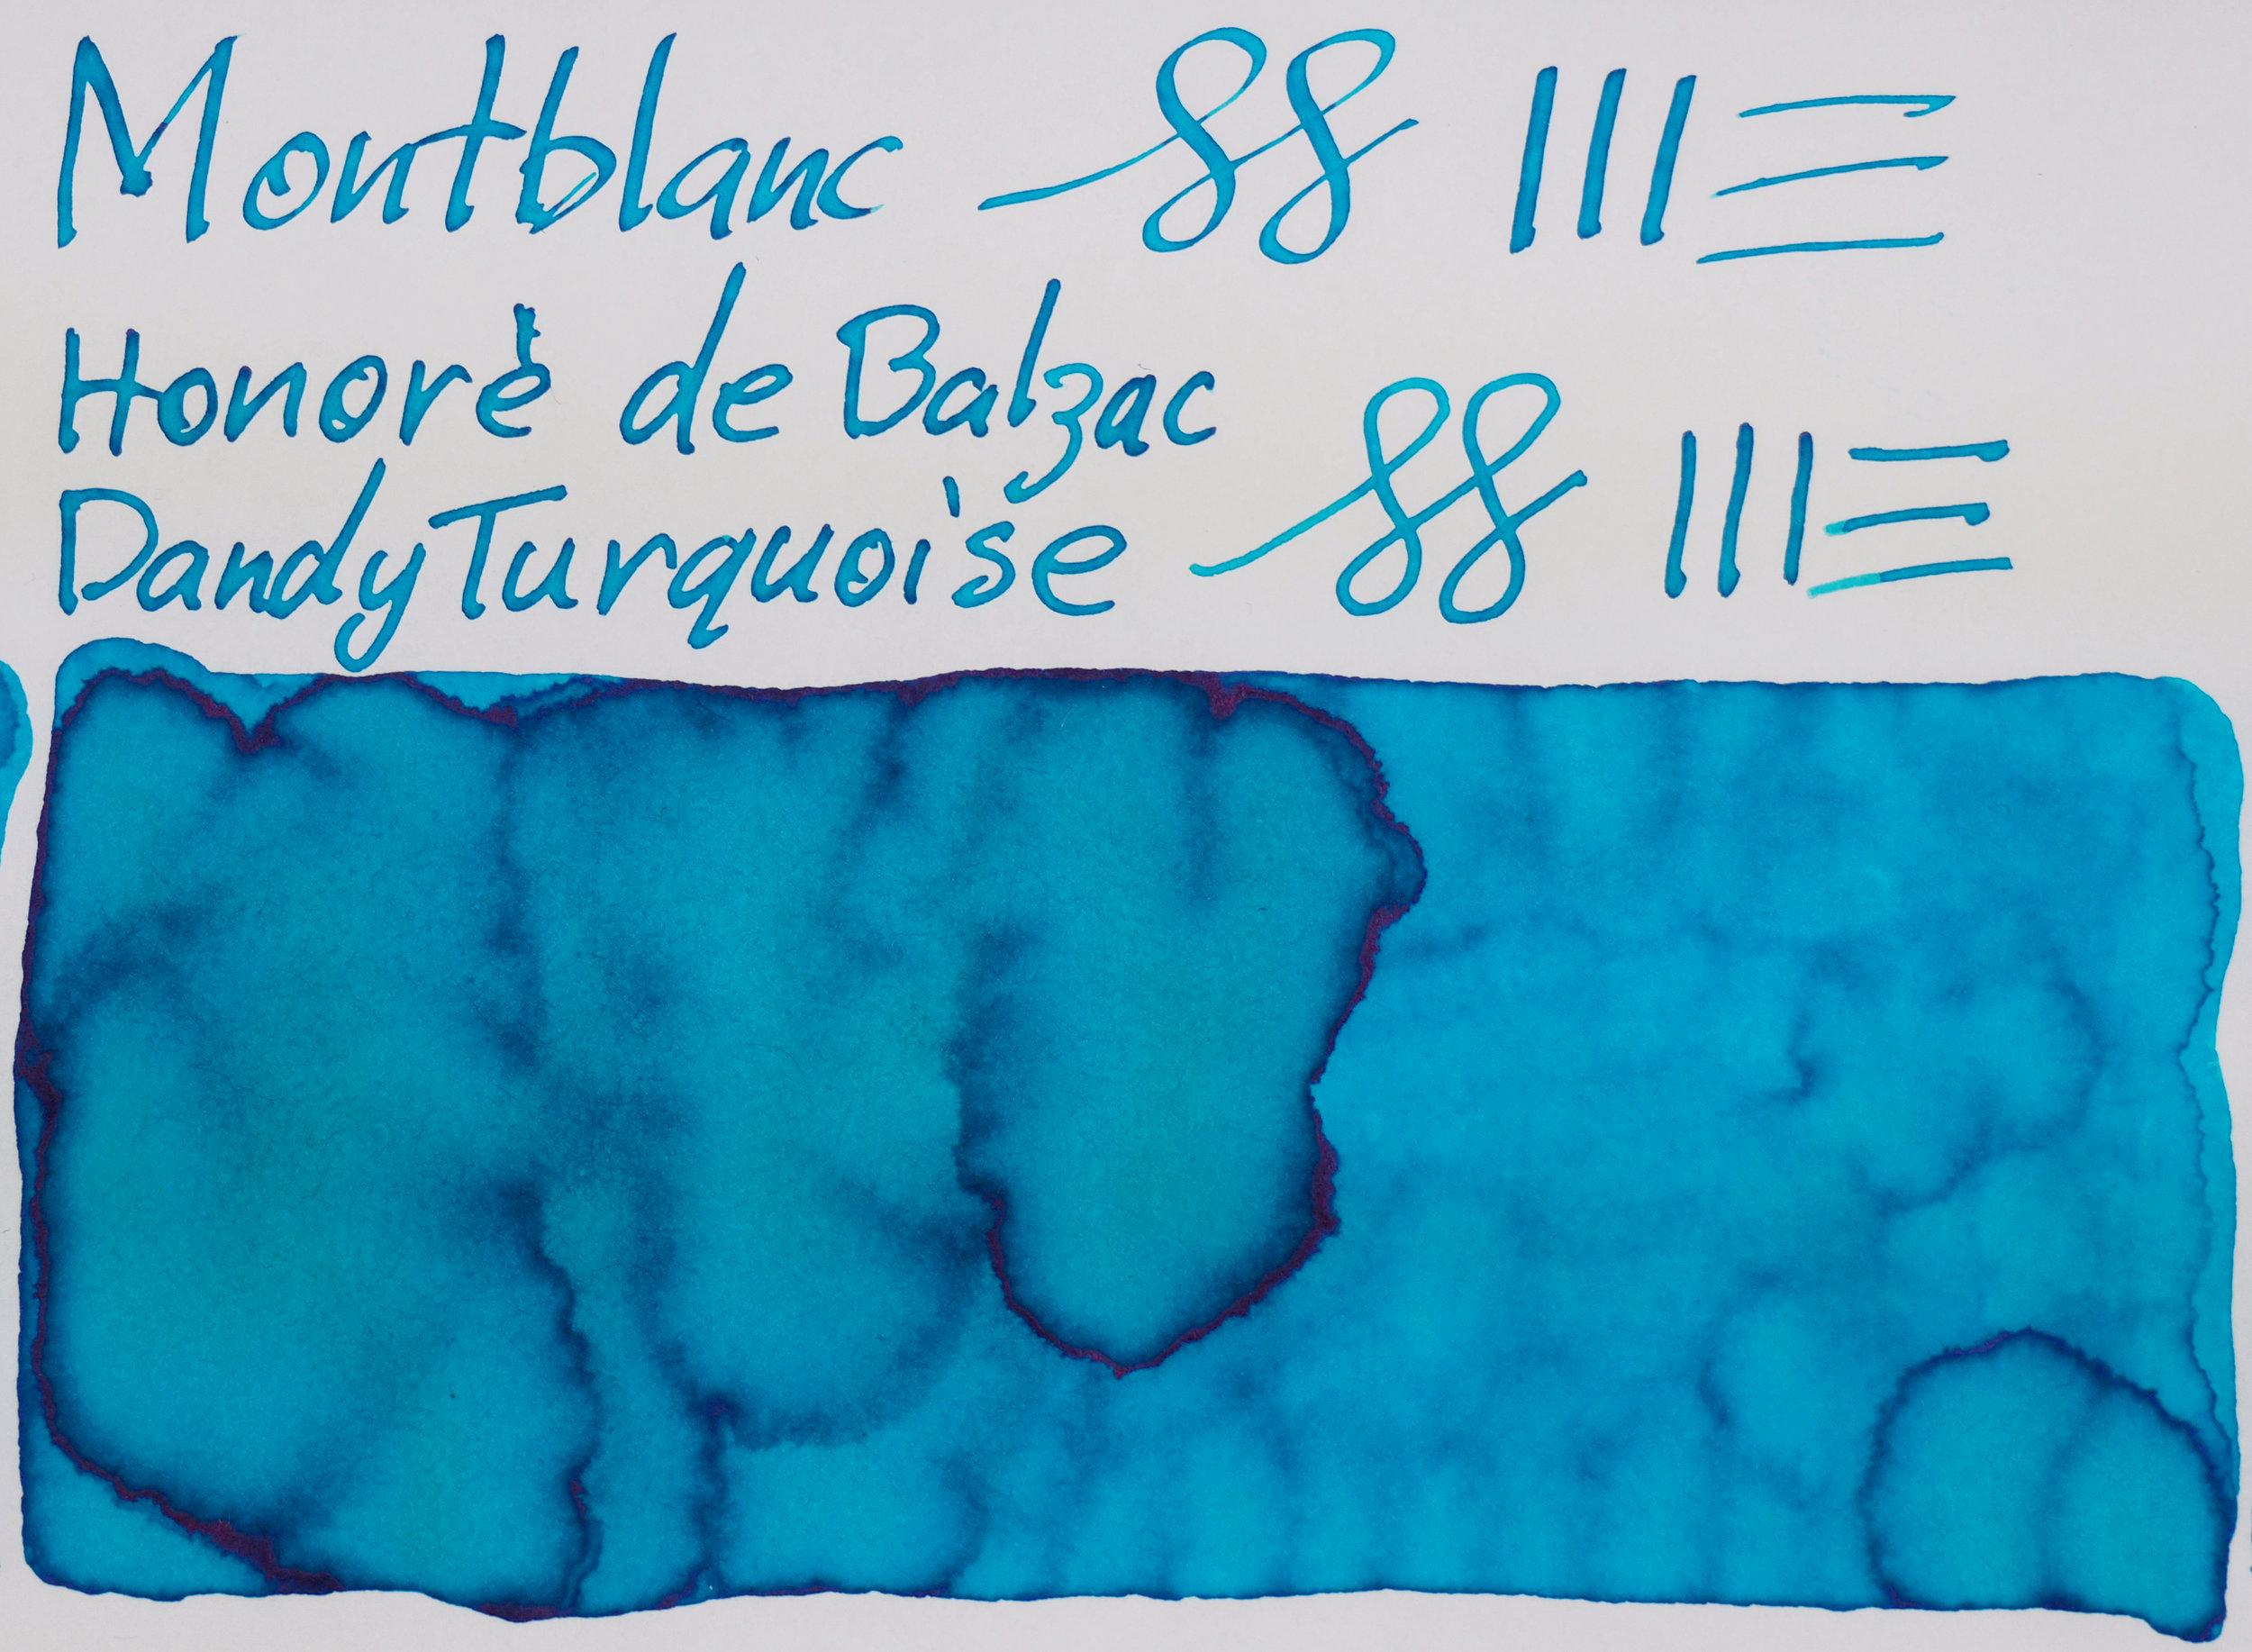 Tomoe River Montblanc Honoré de Balzac Dandy Turquoise.jpg